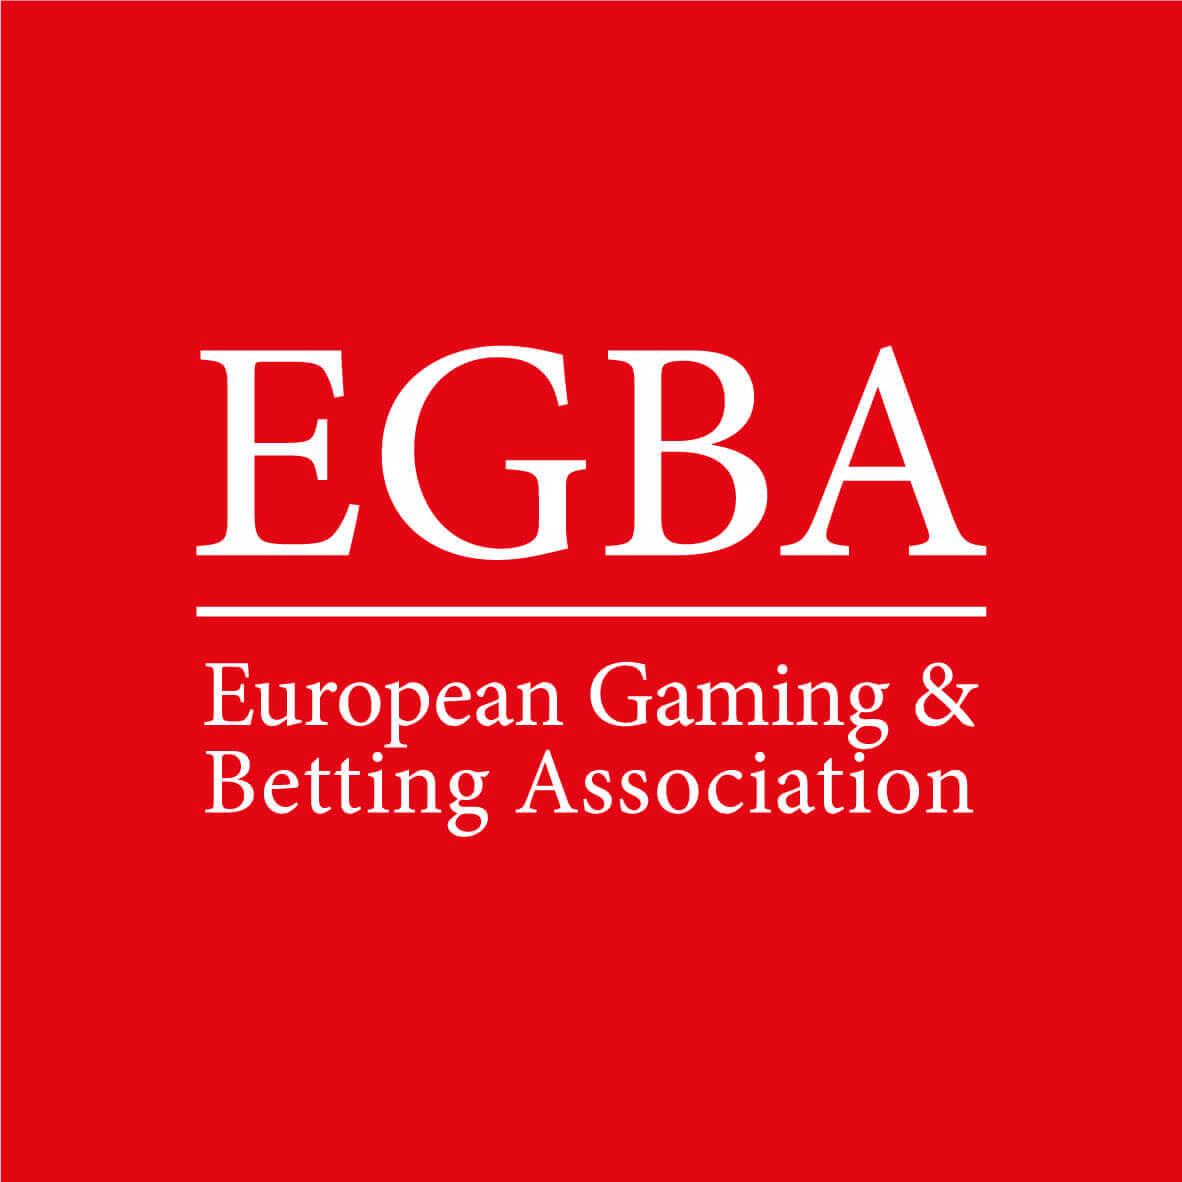 EGBA bestrider påstander Europeisk casinoboom under COVID19